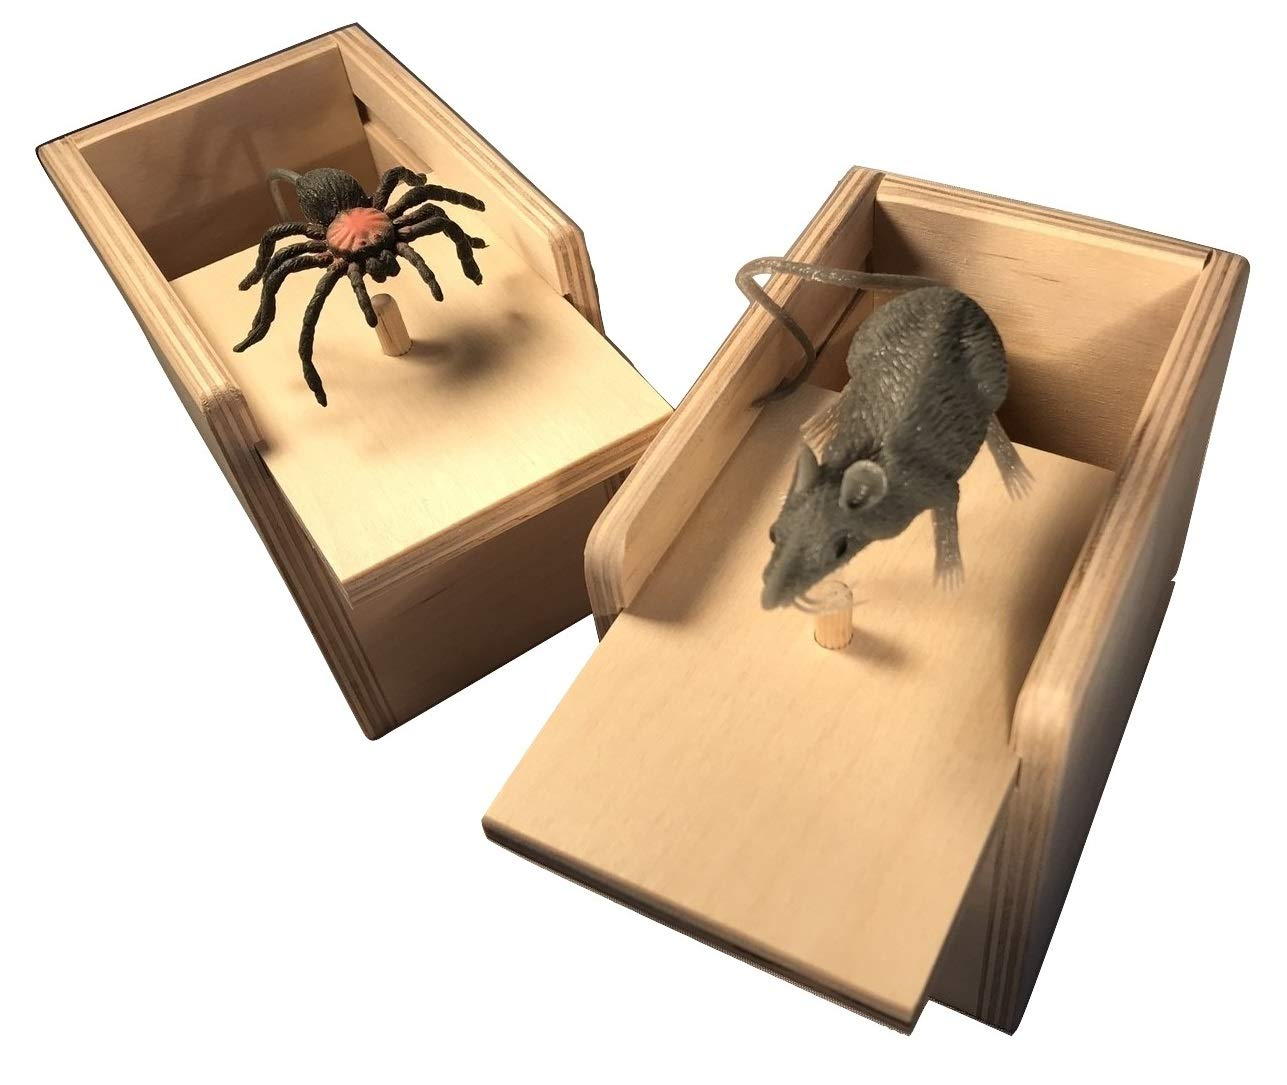 Saving Shepherd Mouse & Spider Surprise Box ~ 2 USA Handmade Fun Prank Gag Gifts by Saving Shepherd (Image #6)